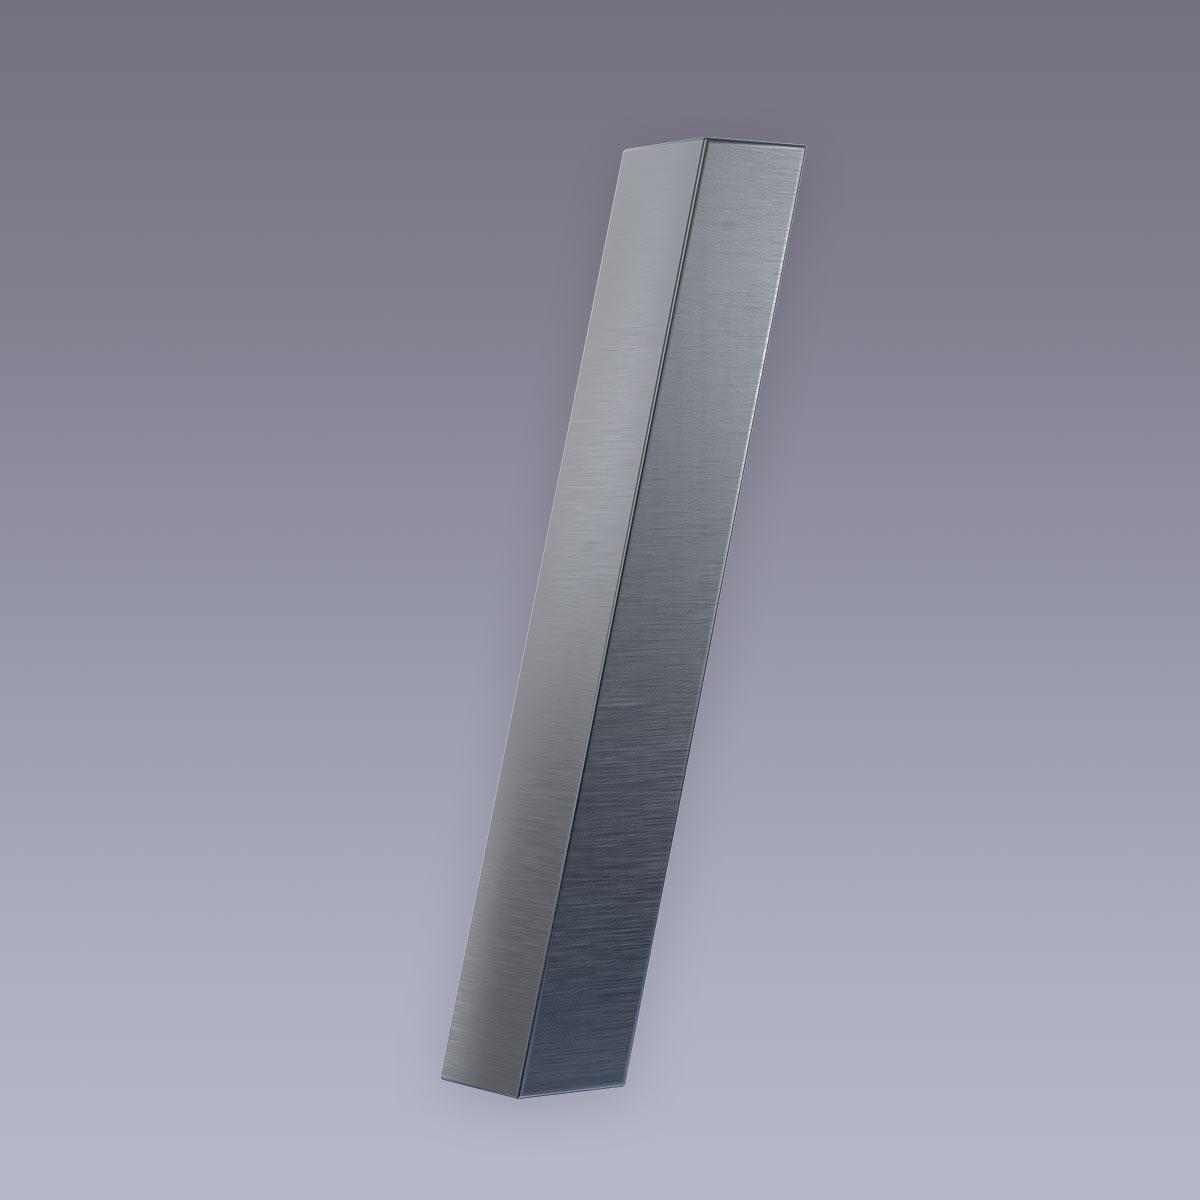 3D Hausnummer / Querstrich Edelstahl anthrazit RAL7016 in 3D Design Arial